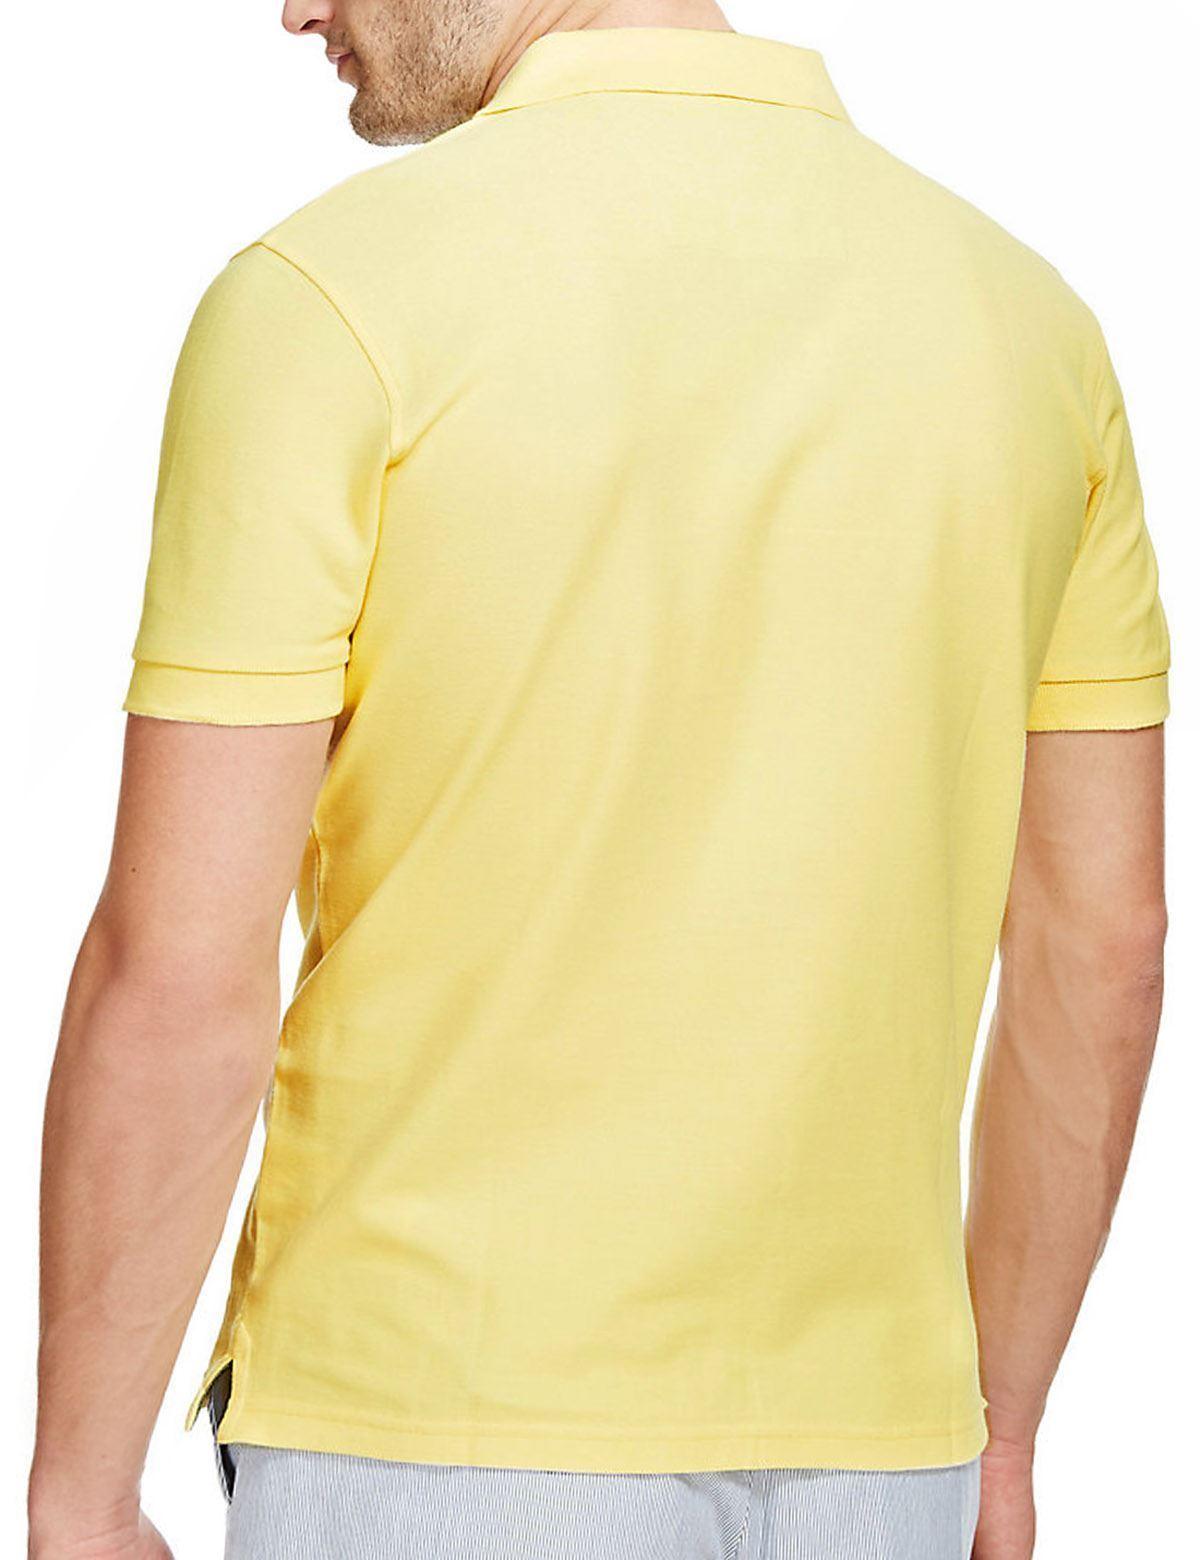 Ex-M-amp-S-Mens-Cotton-Polo-Shirt-Marks-amp-Spencer-Blue-Harbour-Size-S-M thumbnail 12